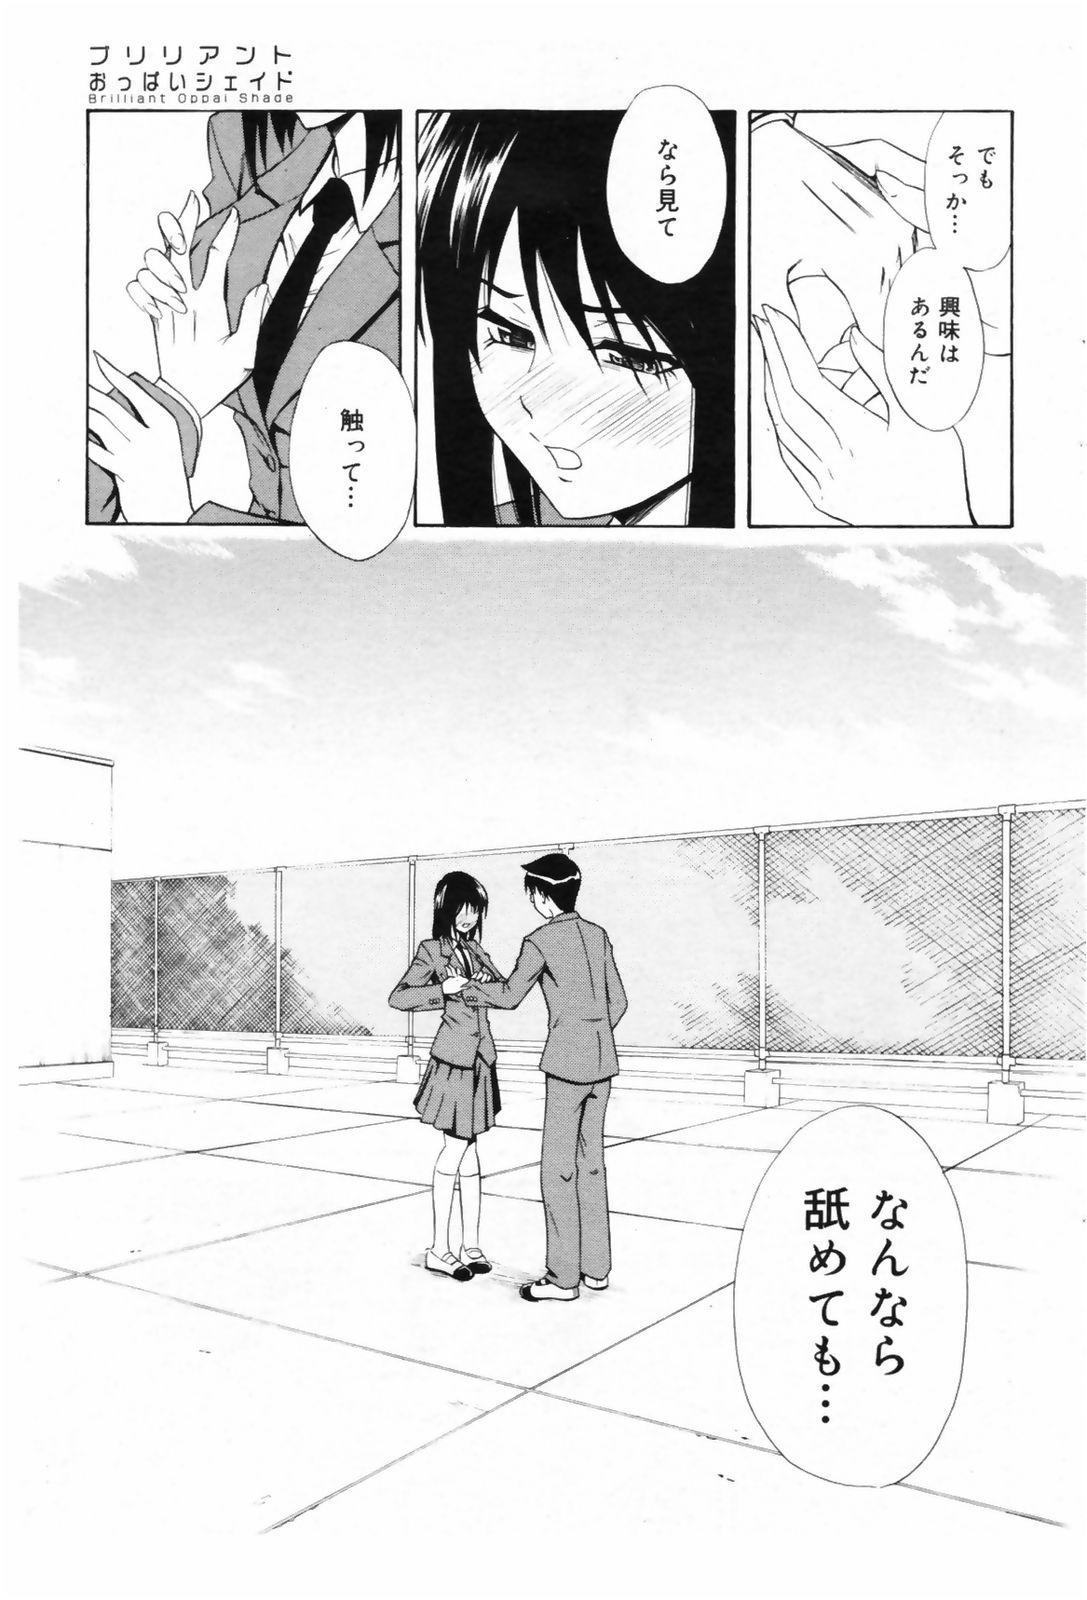 Manga Bangaichi 2009-02 Vol. 234 188